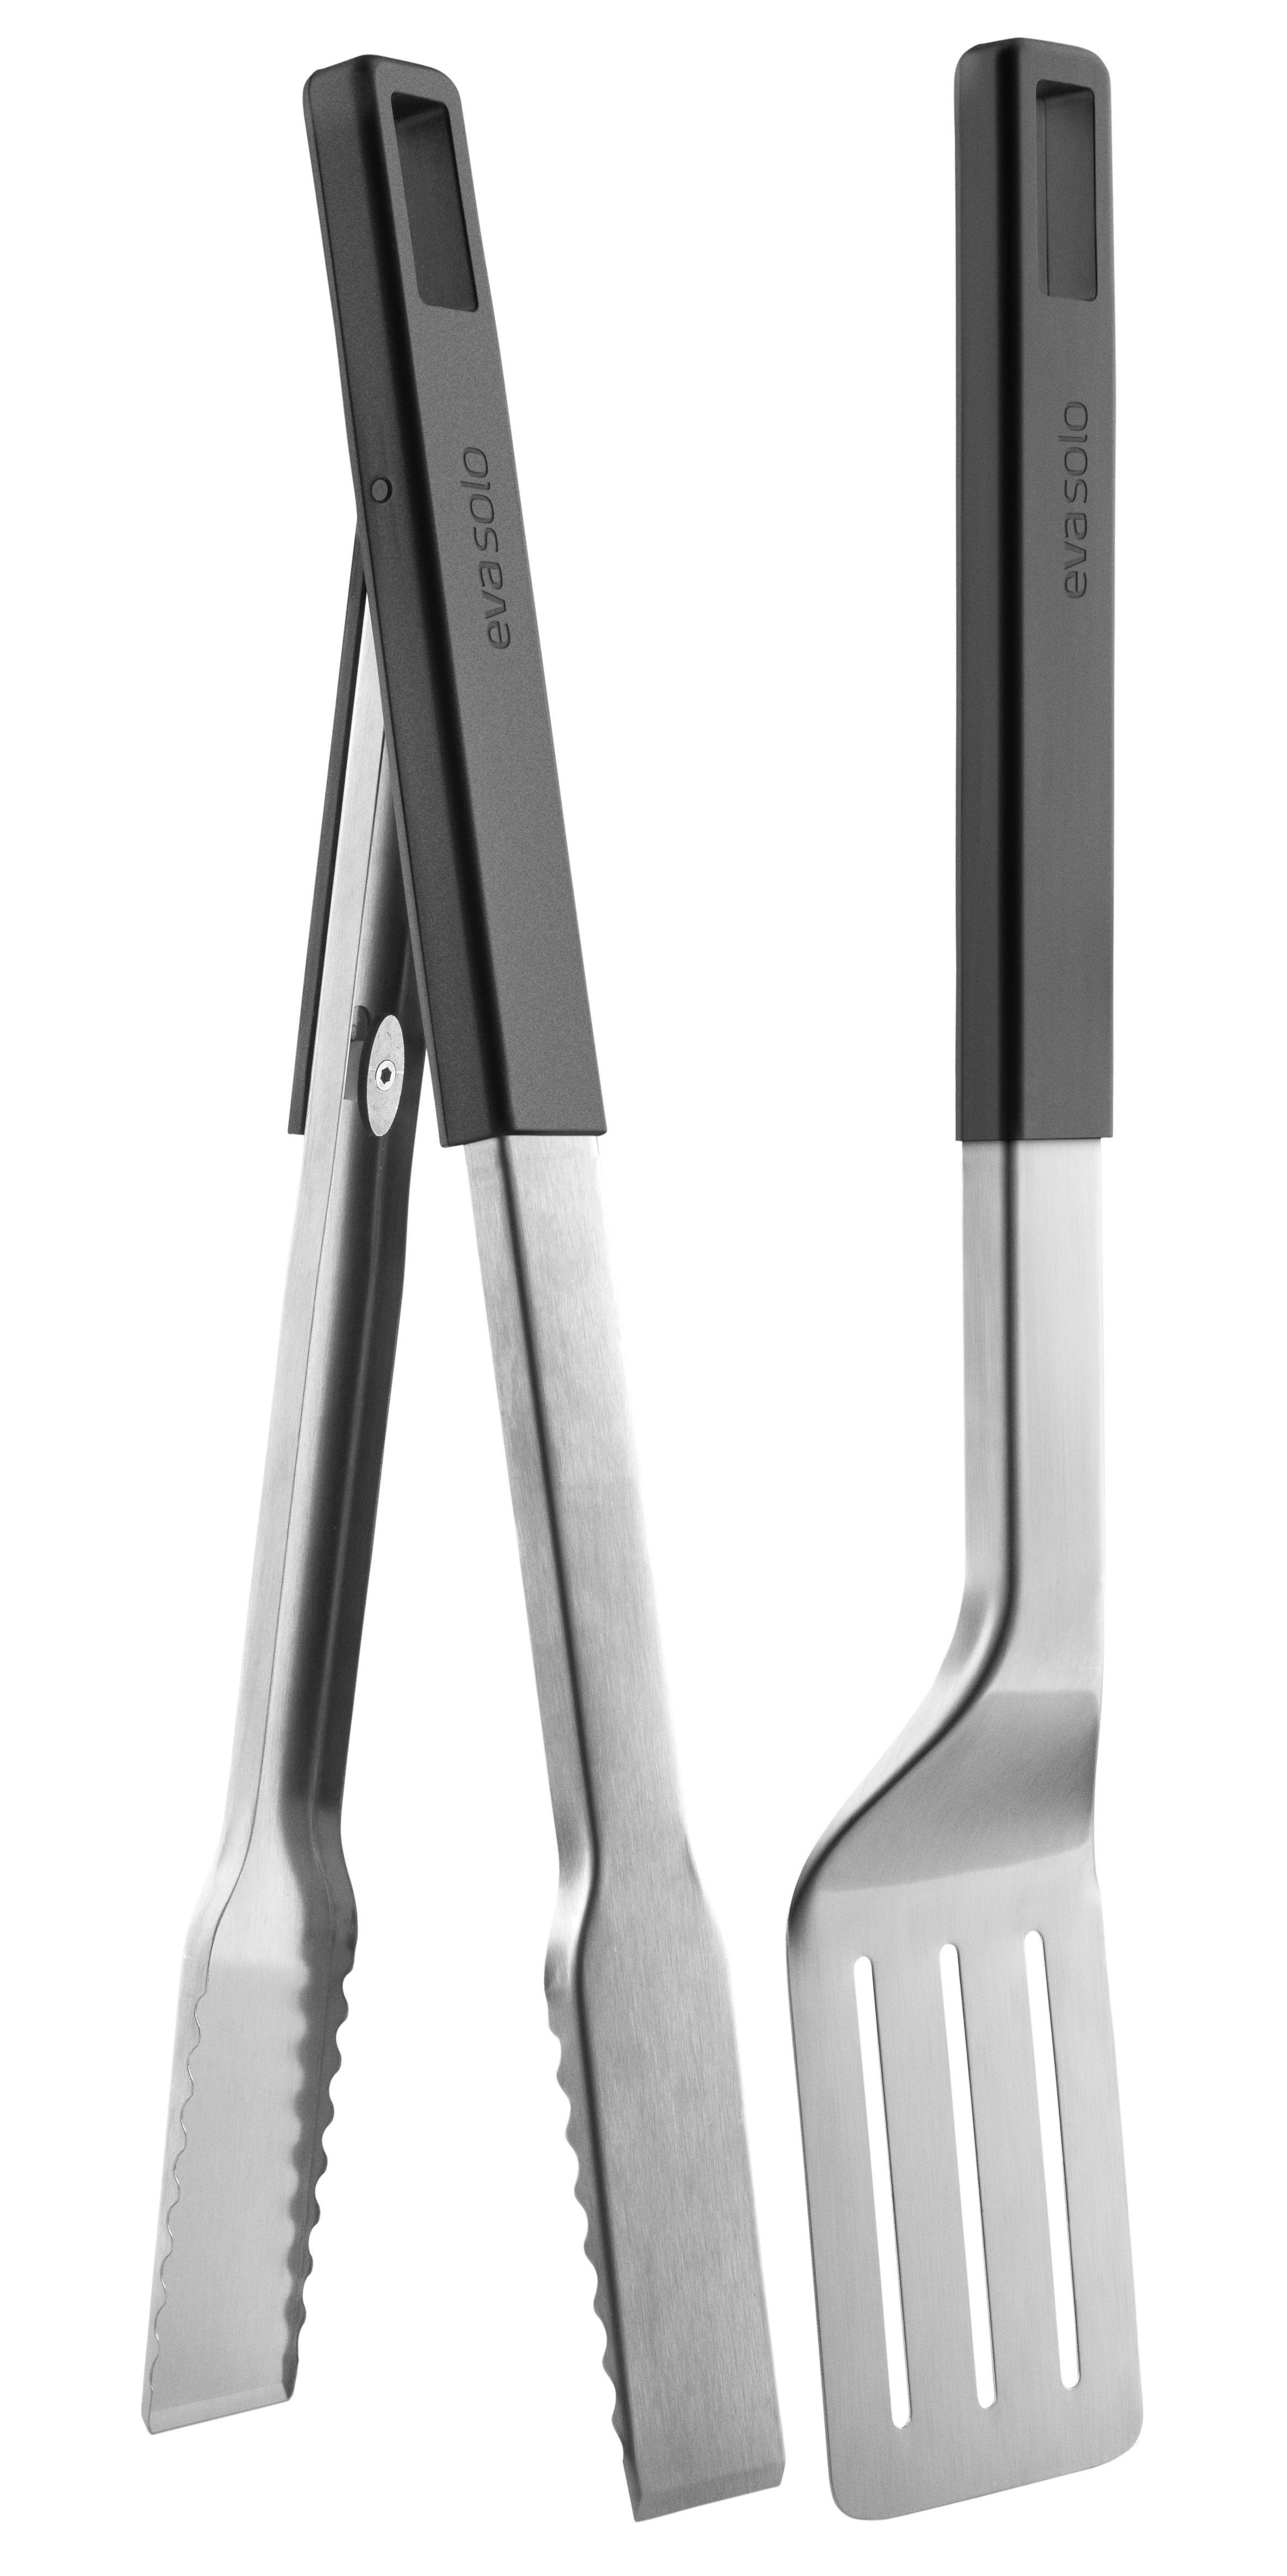 Outdoor - Barbecues et braséros - Set barbecue / pince et spatule - Eva Solo - Acier / Poignée noire - Acier, Silicone